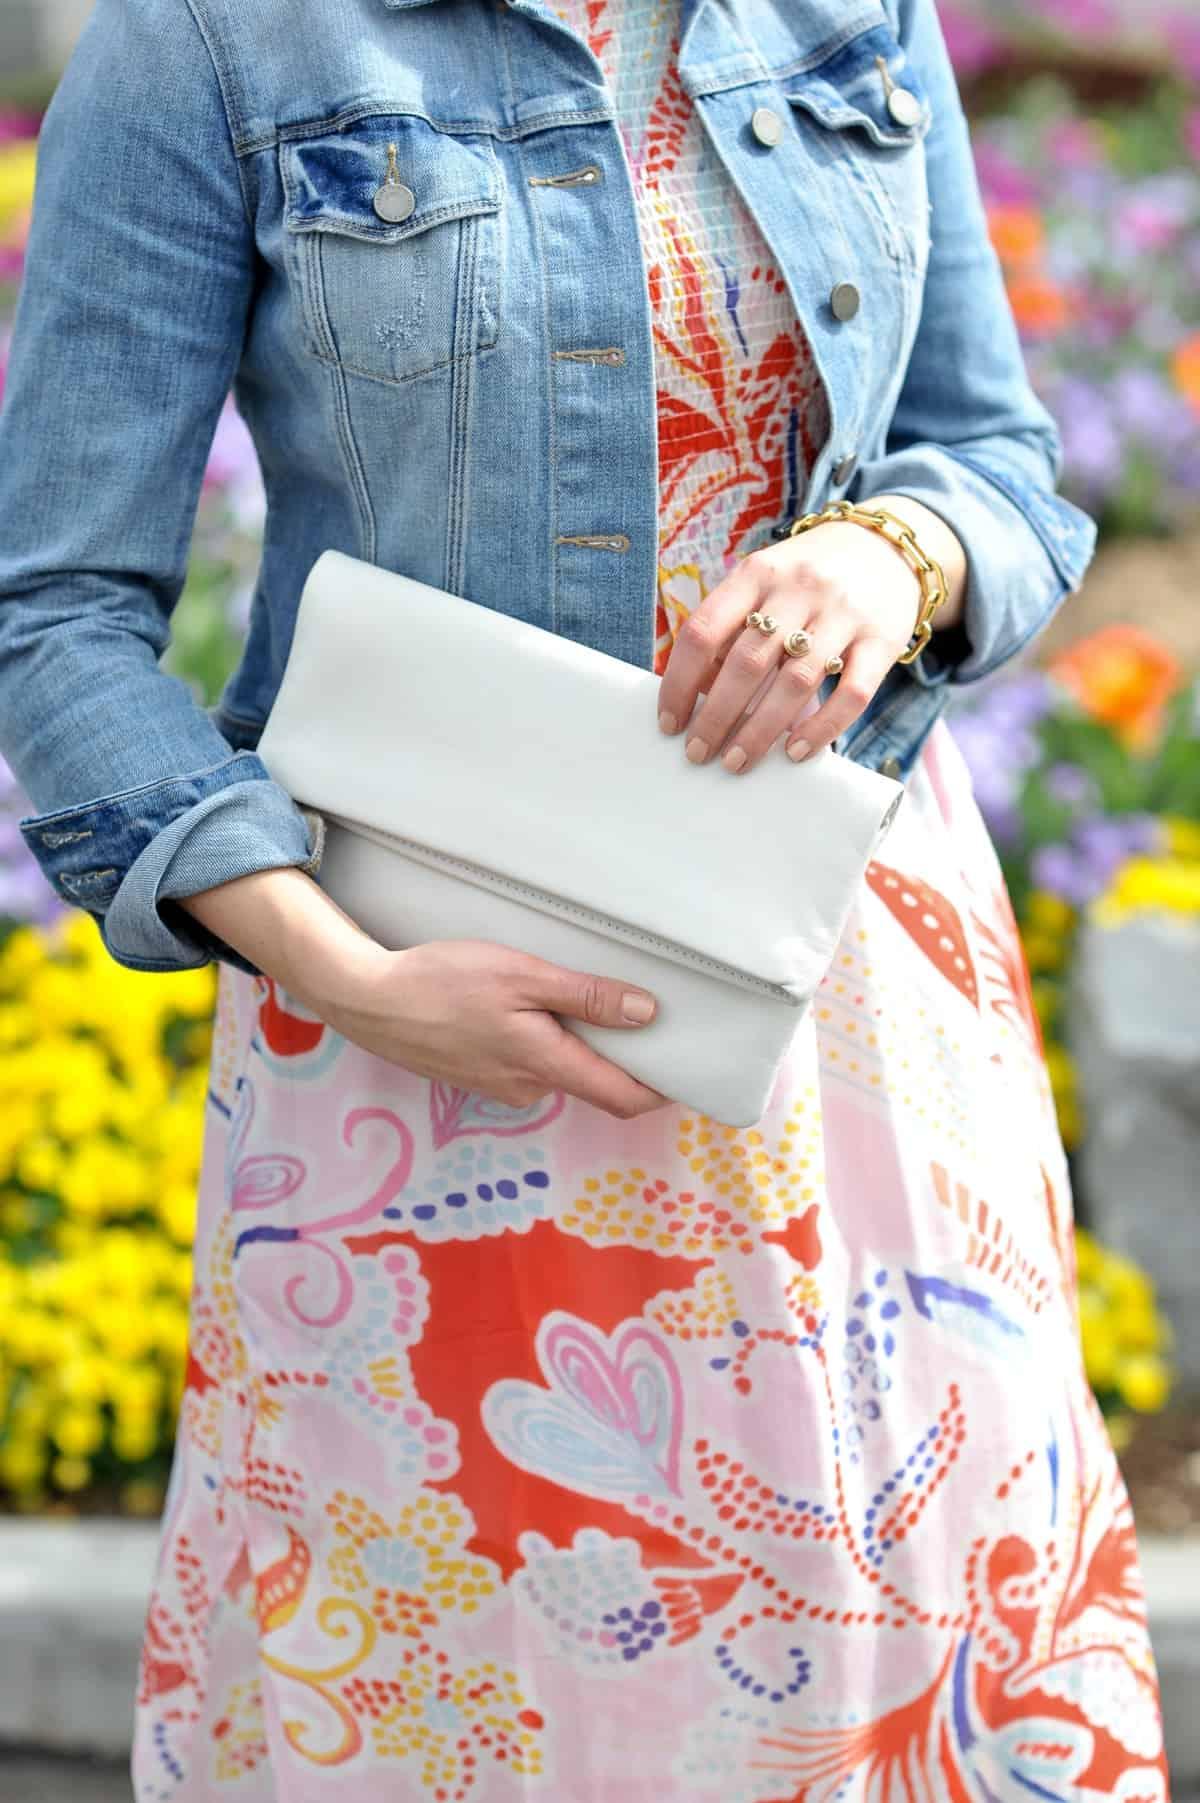 Banjanan Cochella Dress - printed floral dress for summer - My Style Vita - @mystylevita - 17